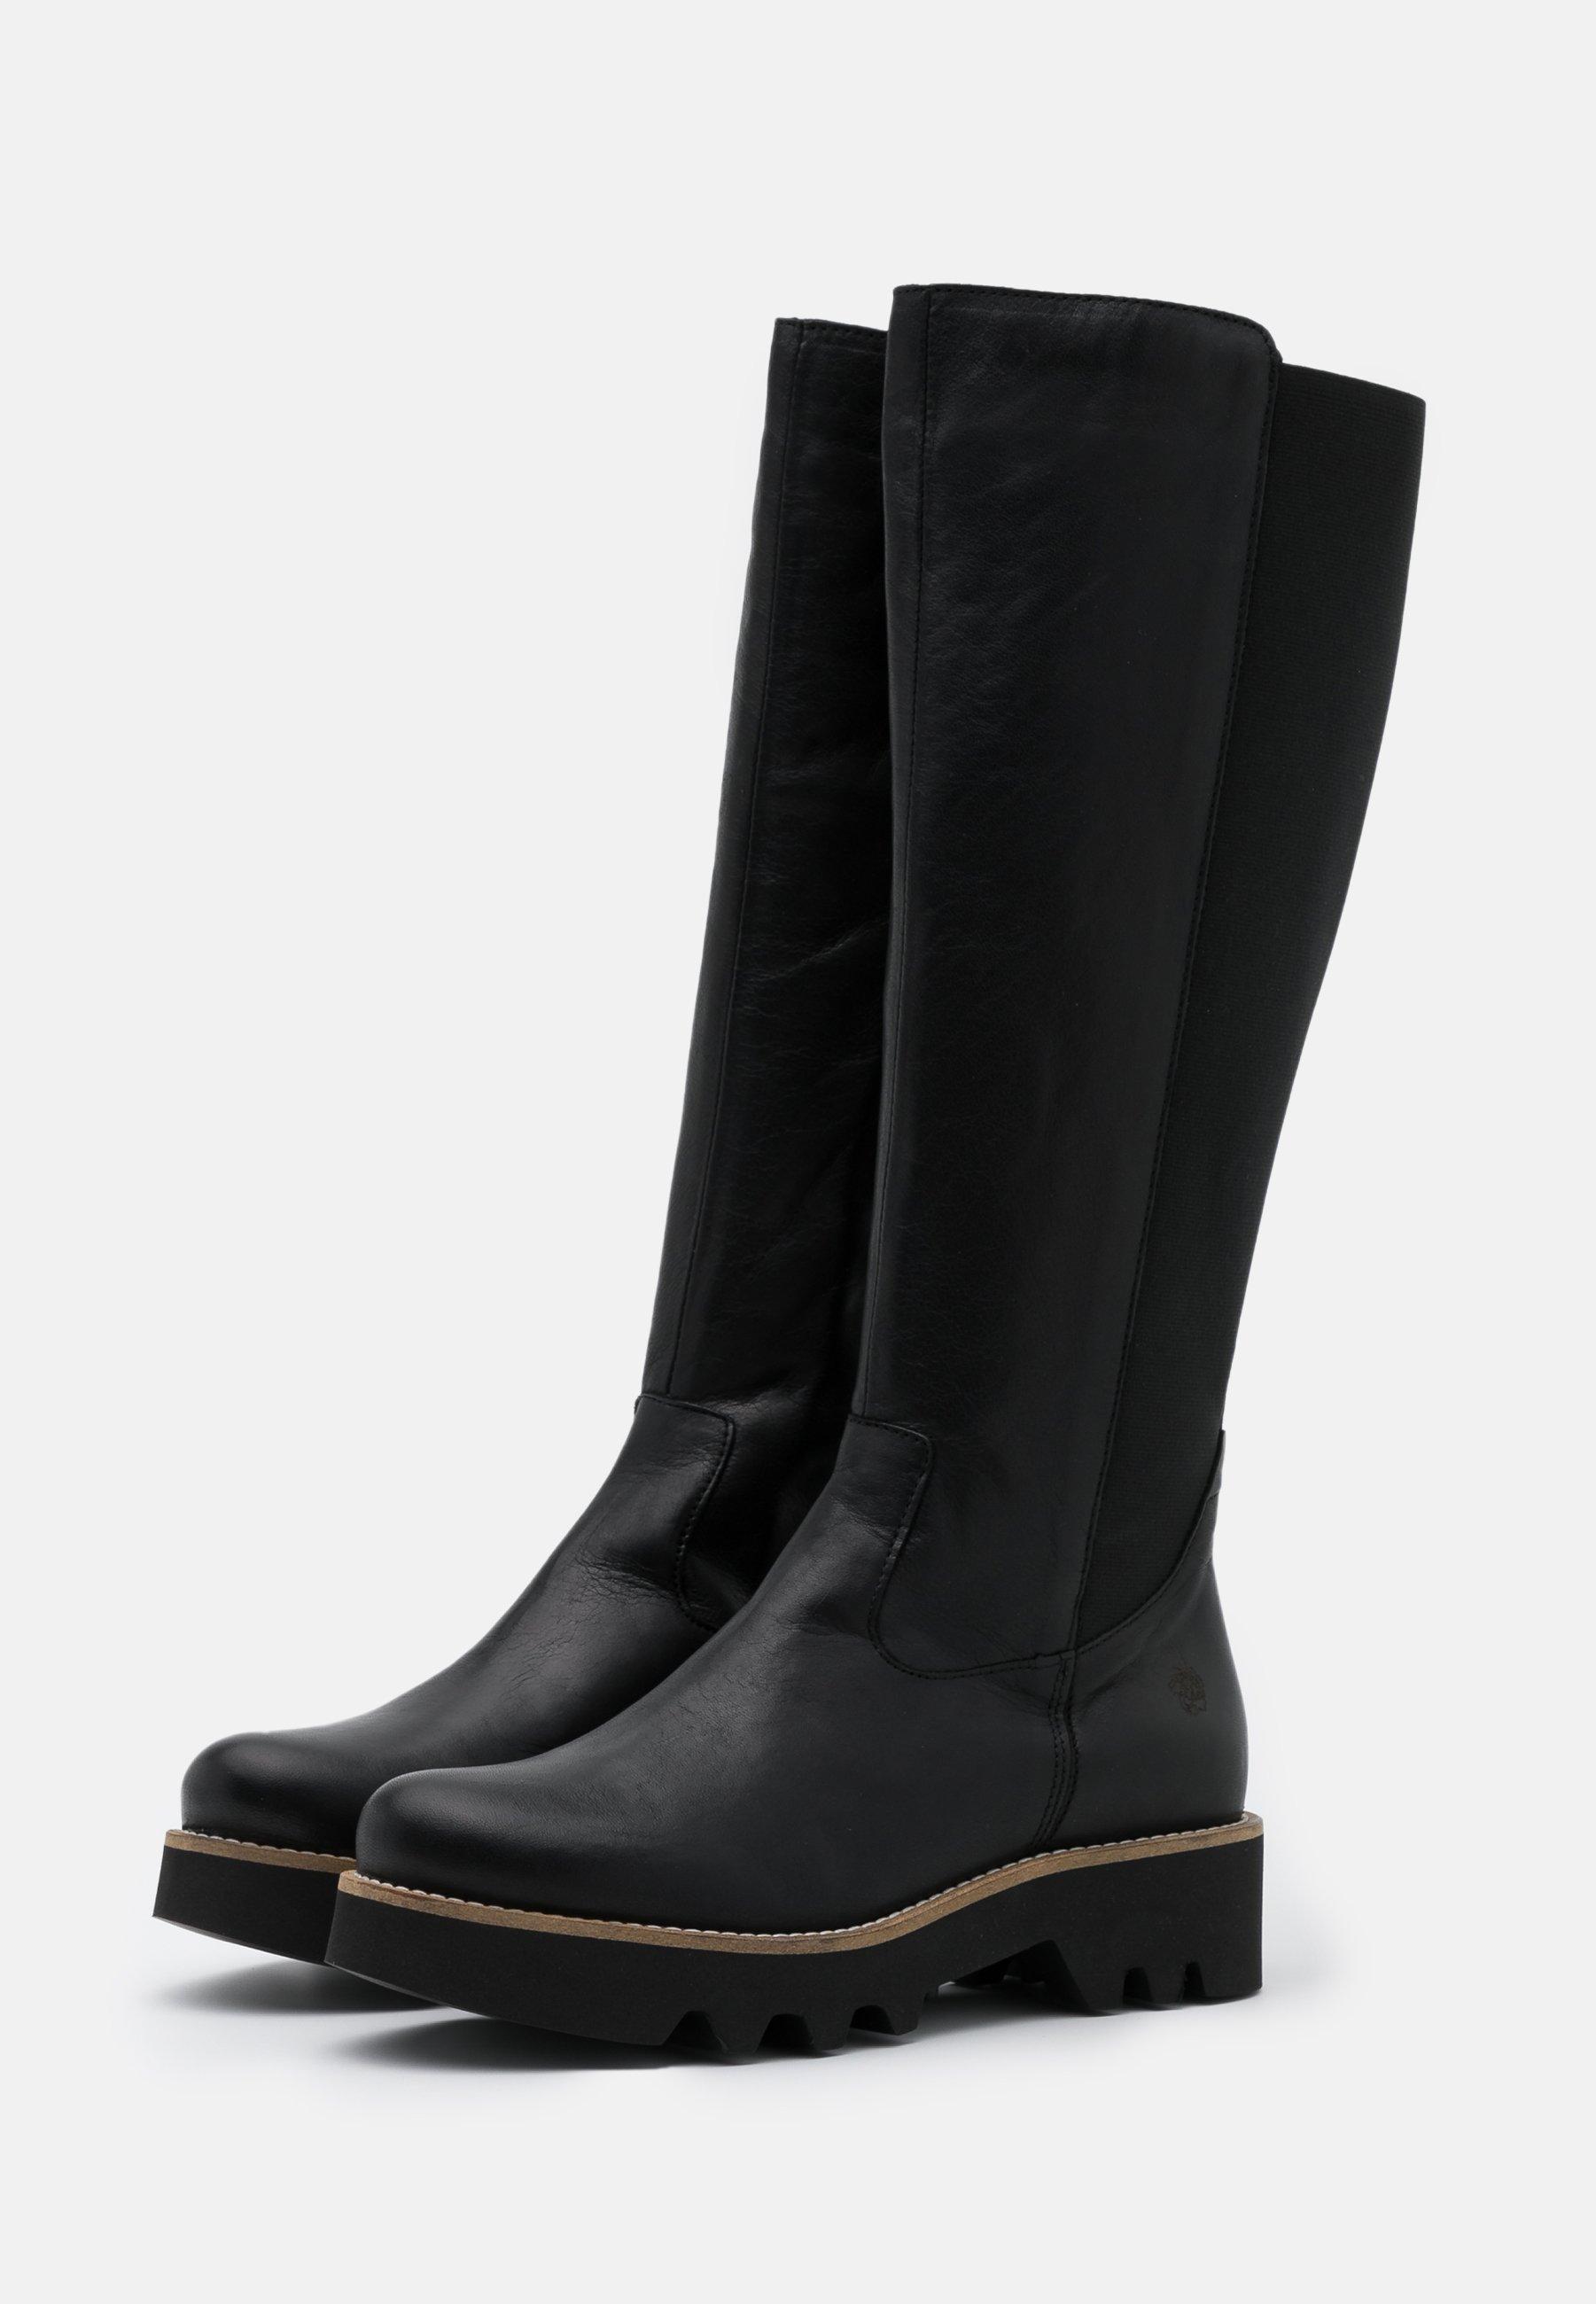 Purchase Purchase Cheap Women's Shoes Apple of Eden VIOLA Platform boots black X2taqWKeJ bm8L261vs